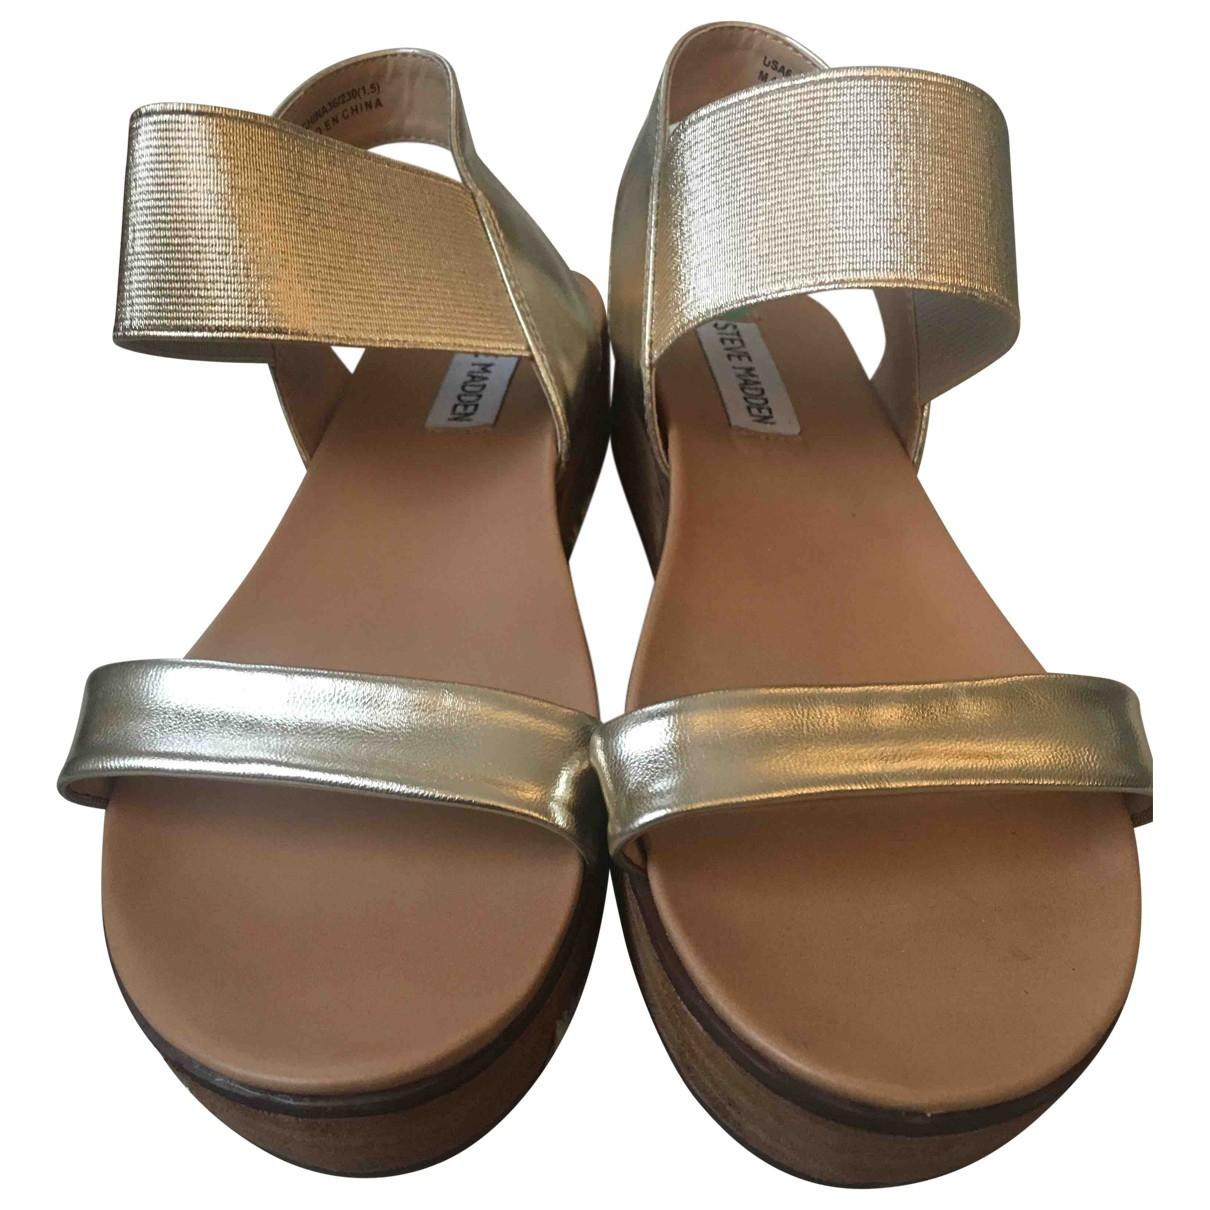 Steve Madden \N Gold Patent leather Sandals for Women 36 EU